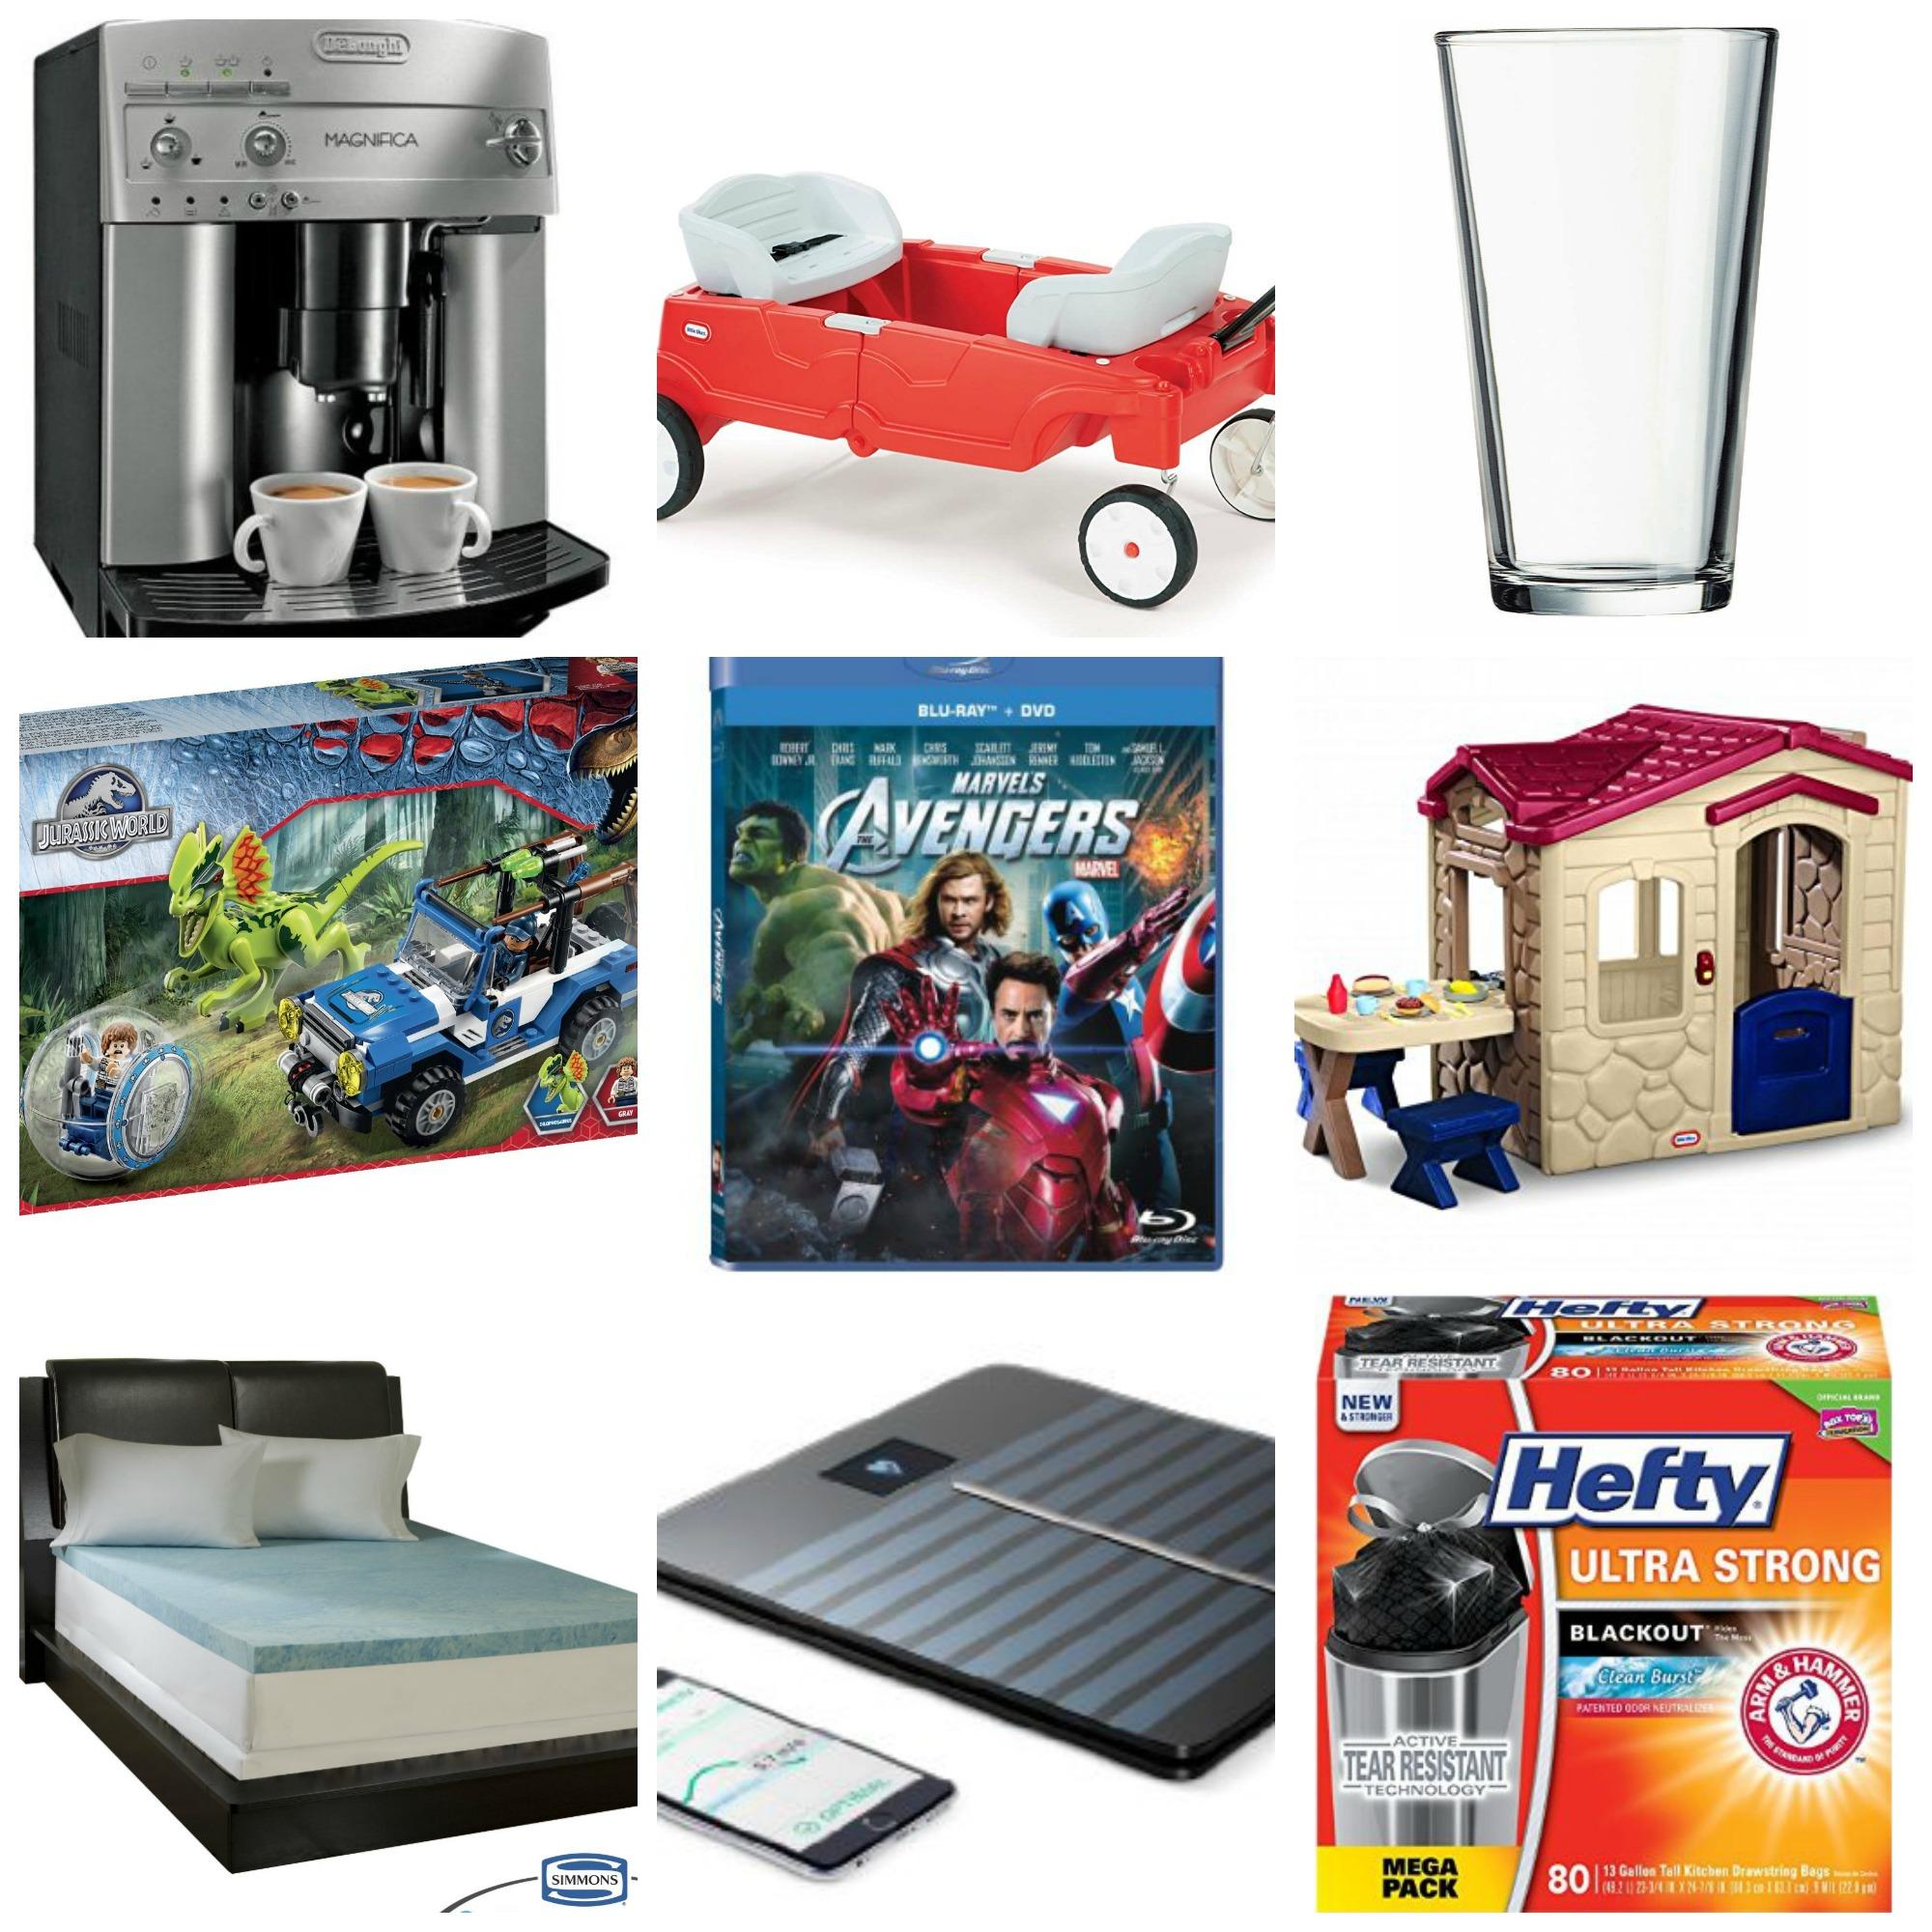 amazon  huge round up of deals  little tikes  lego  hefty